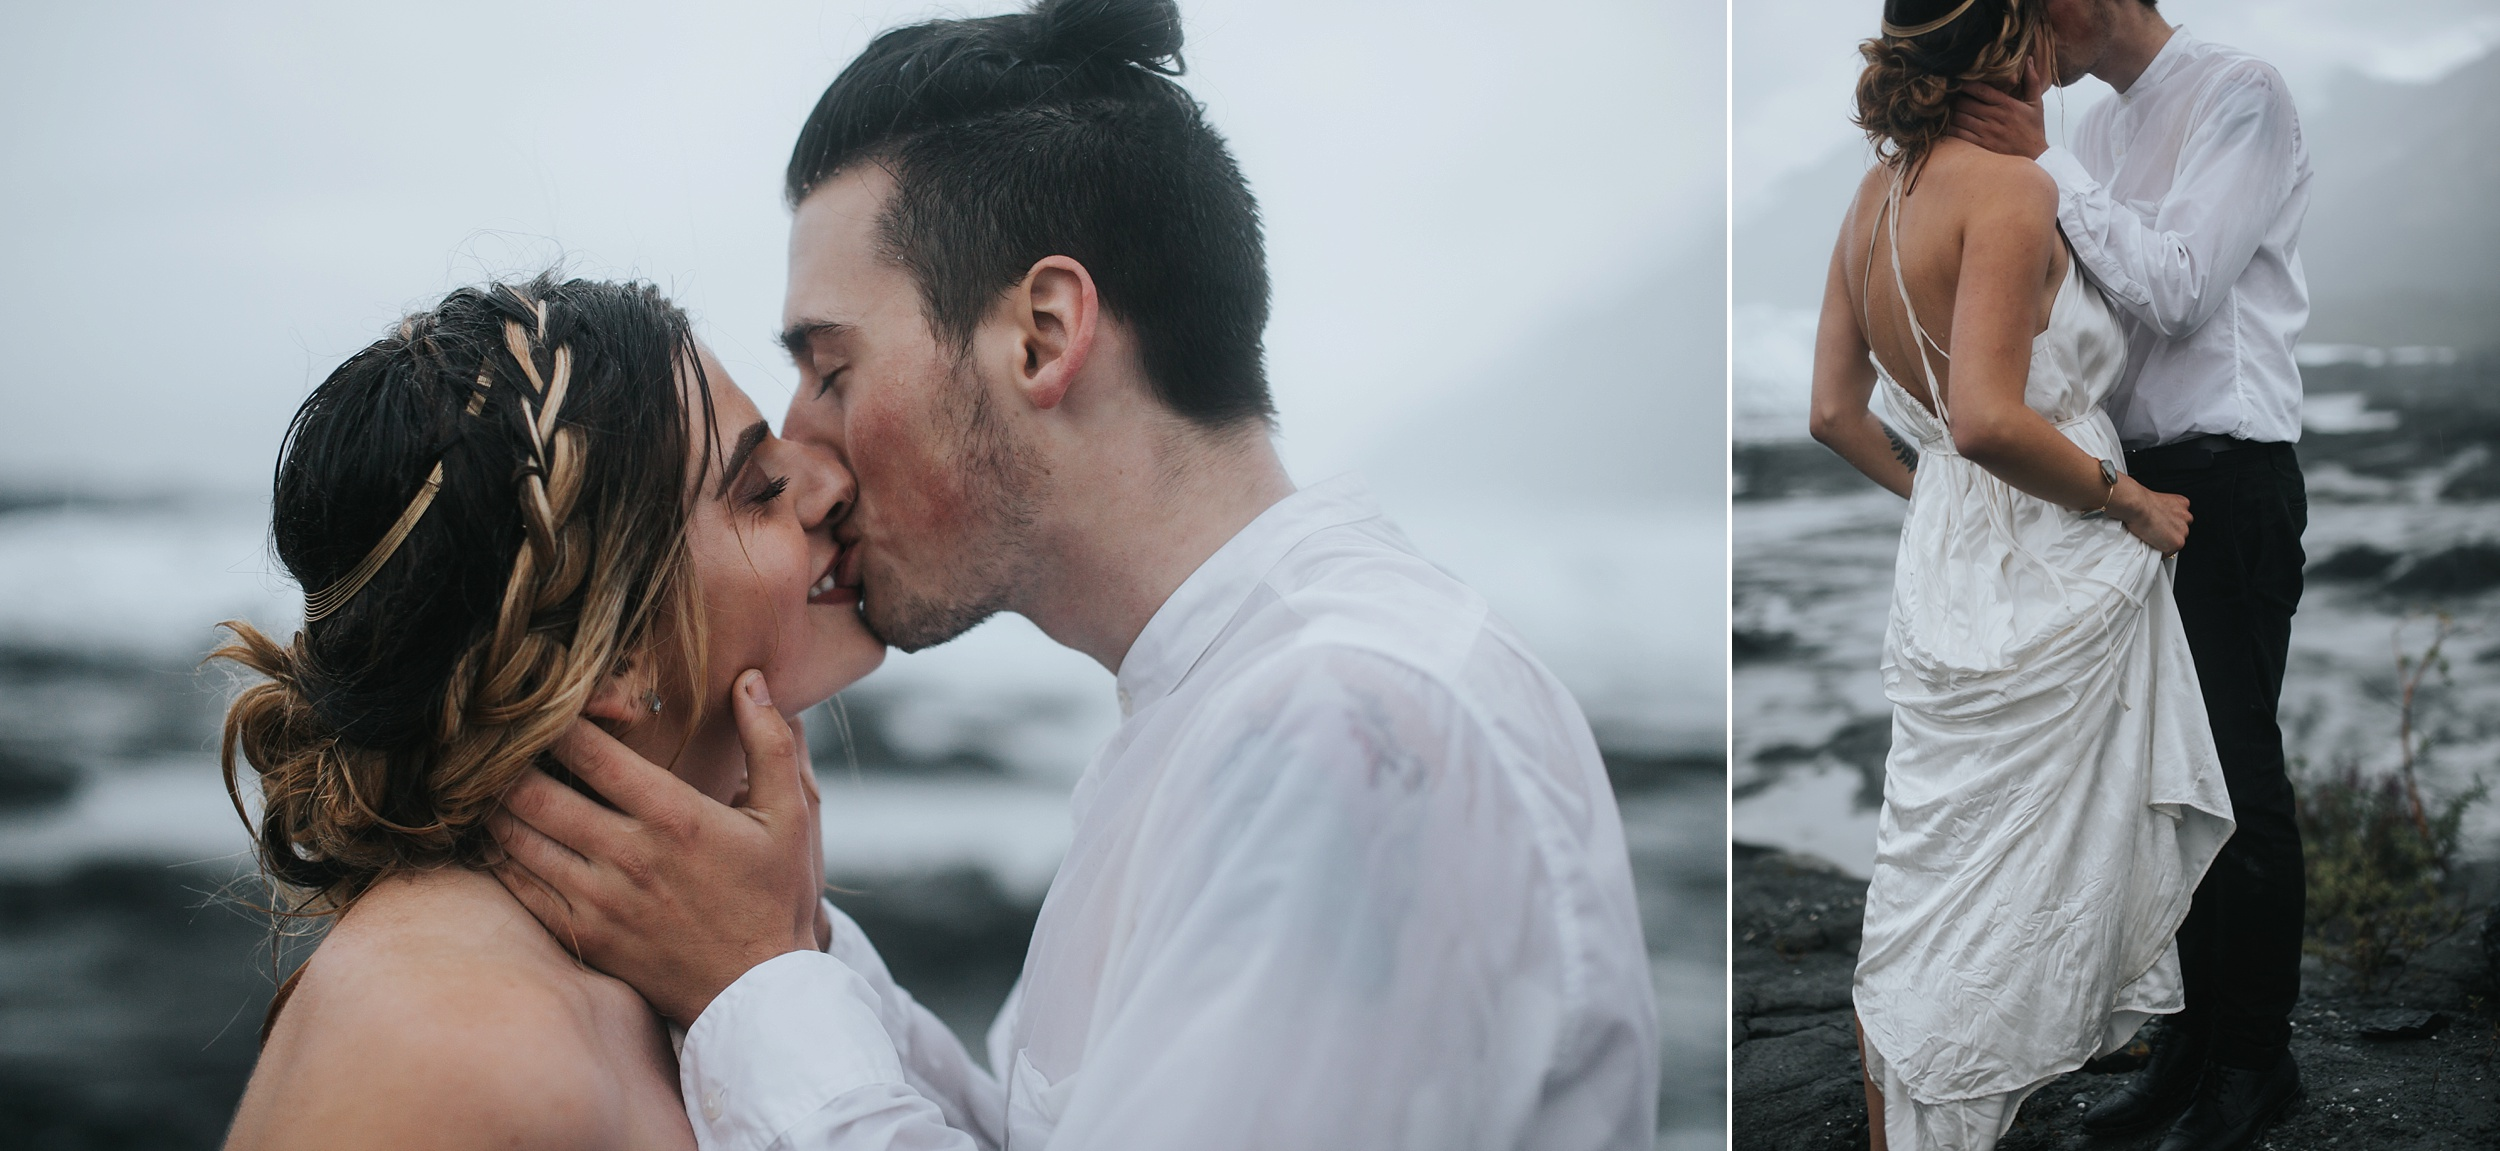 rainy outdoor wedding in Alaska